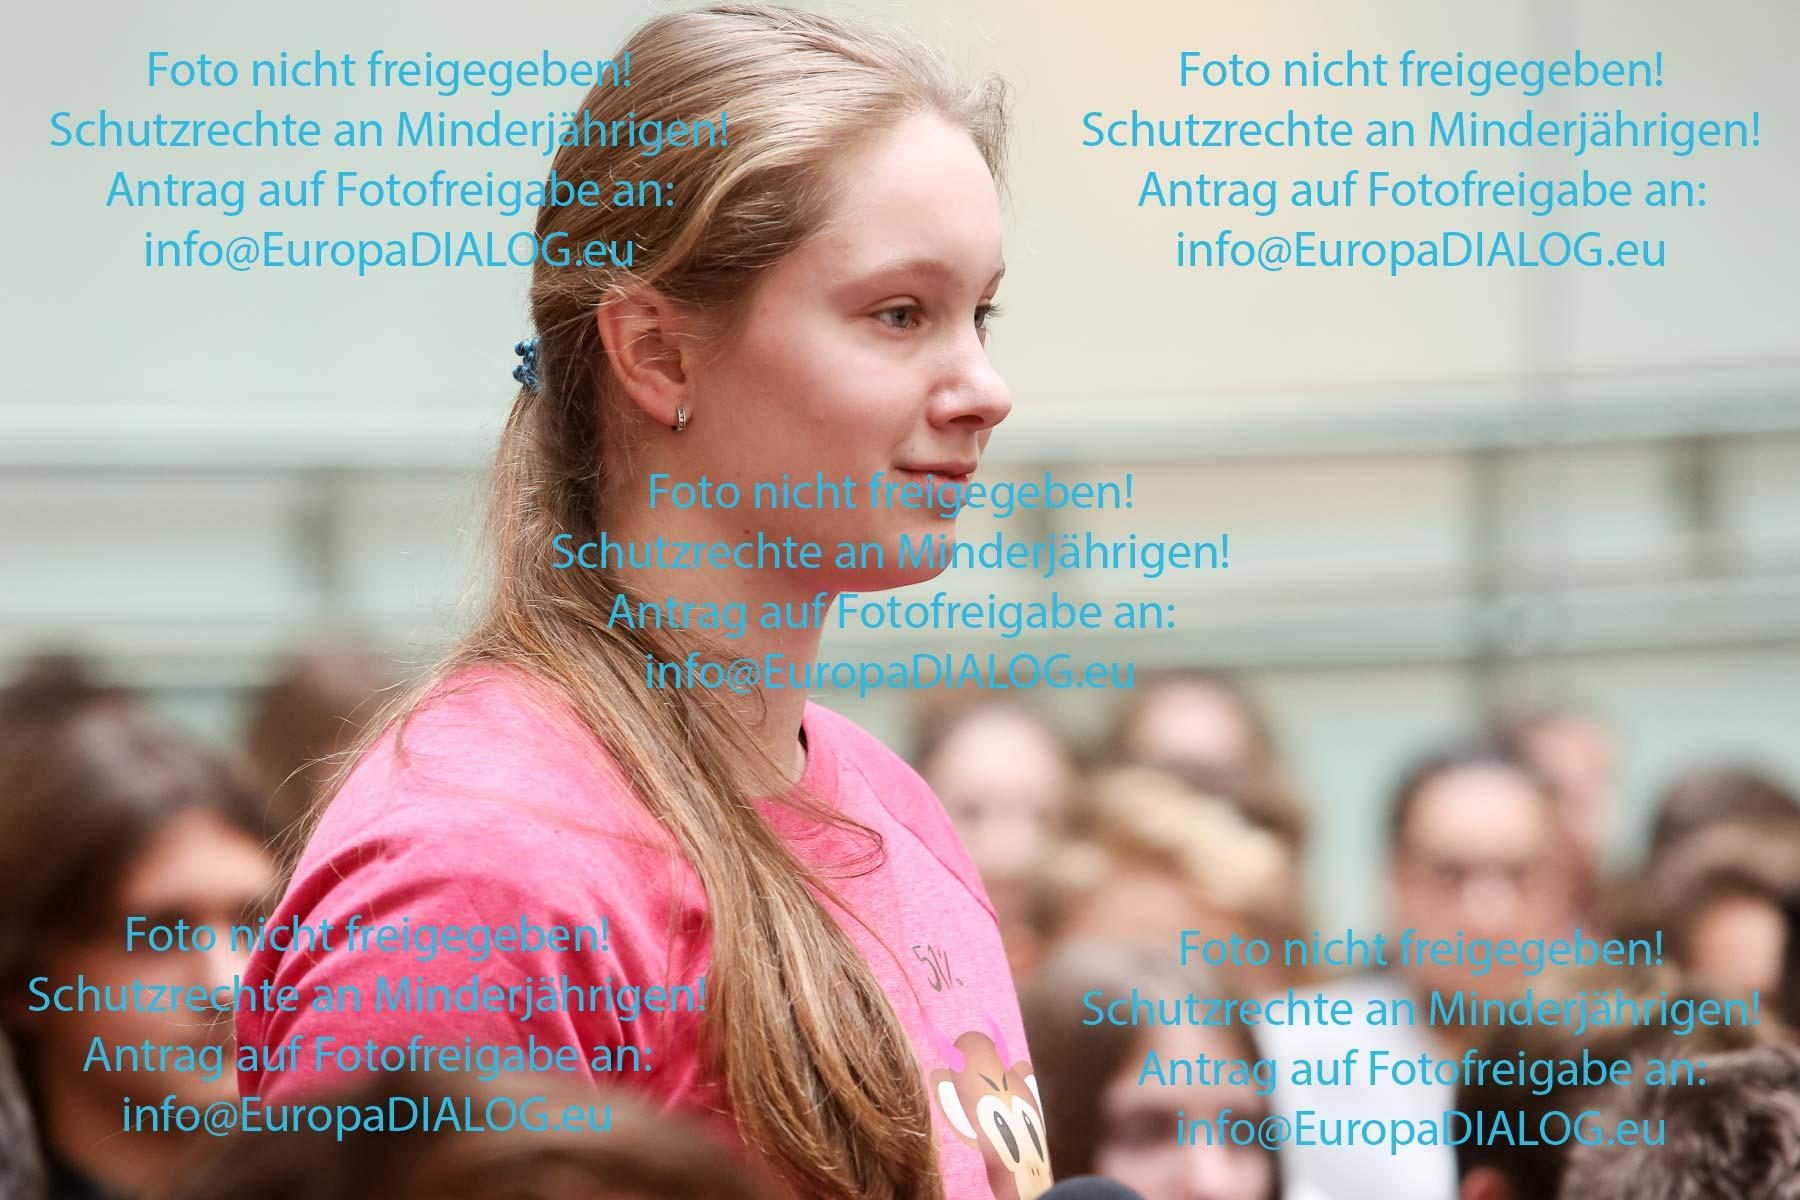 europadialog_bettina-prendergast_s_b03__391773_-katharina-schiffl__